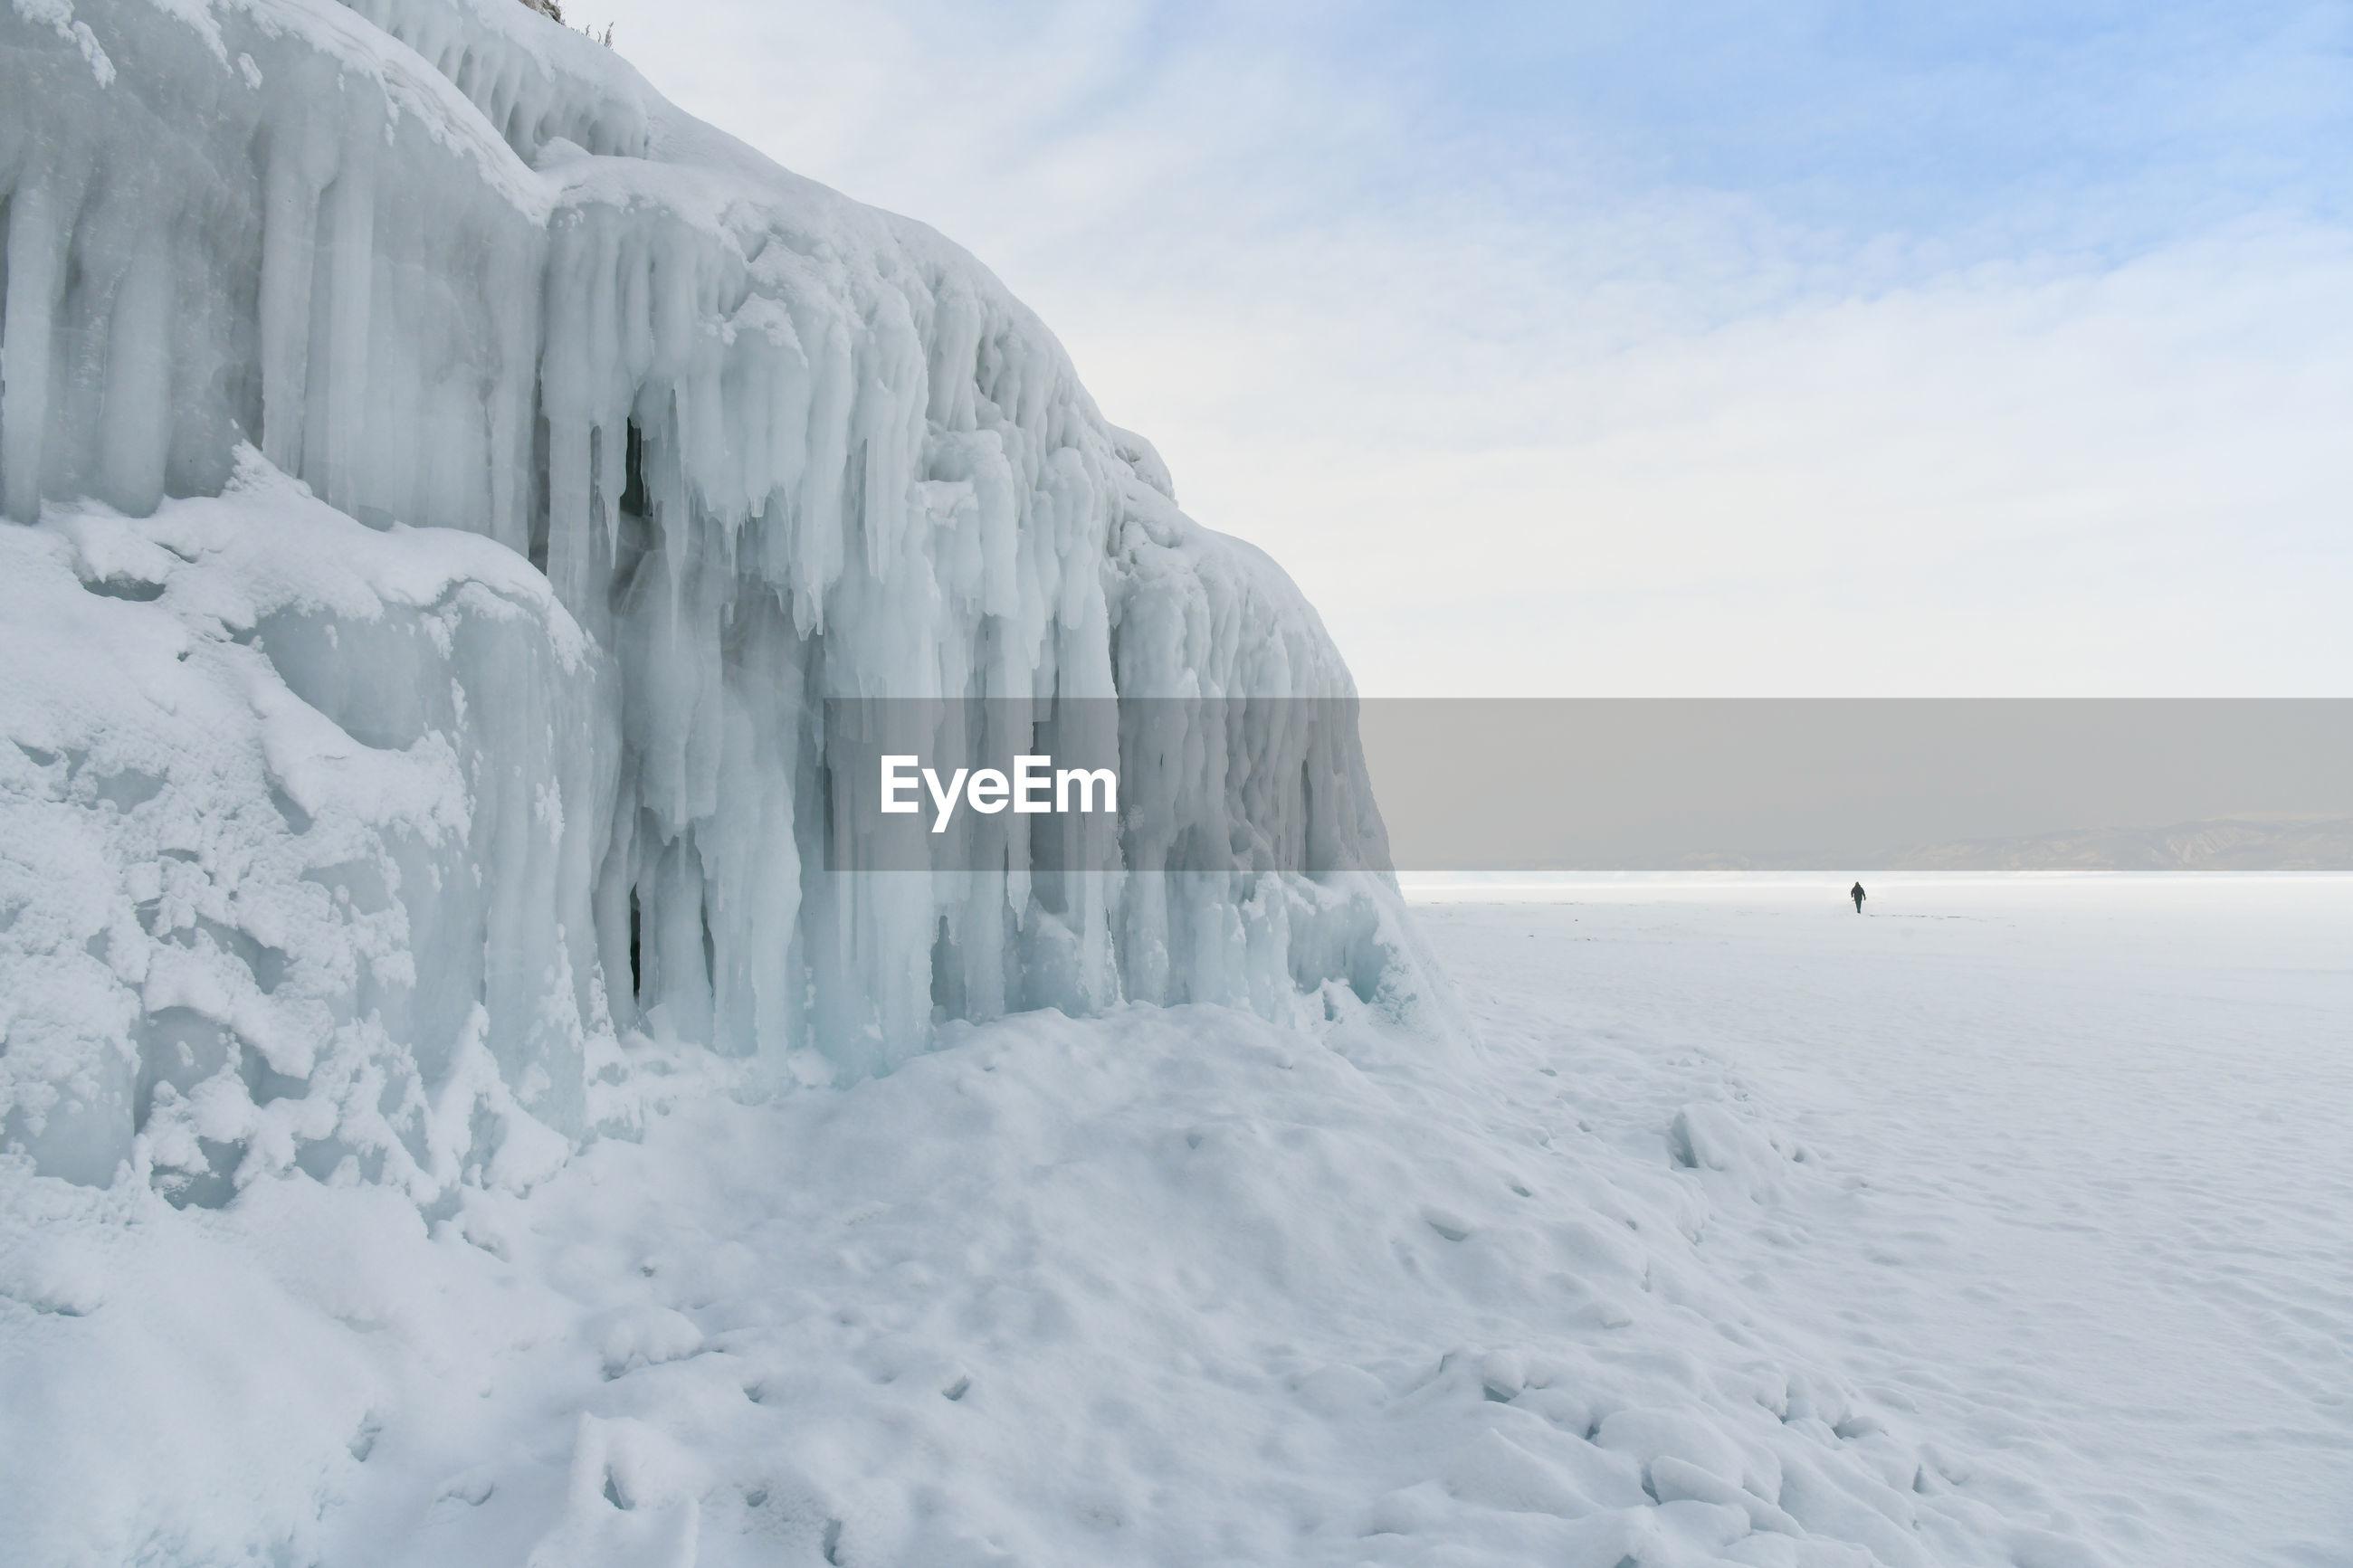 SNOW ON LANDSCAPE AGAINST SKY